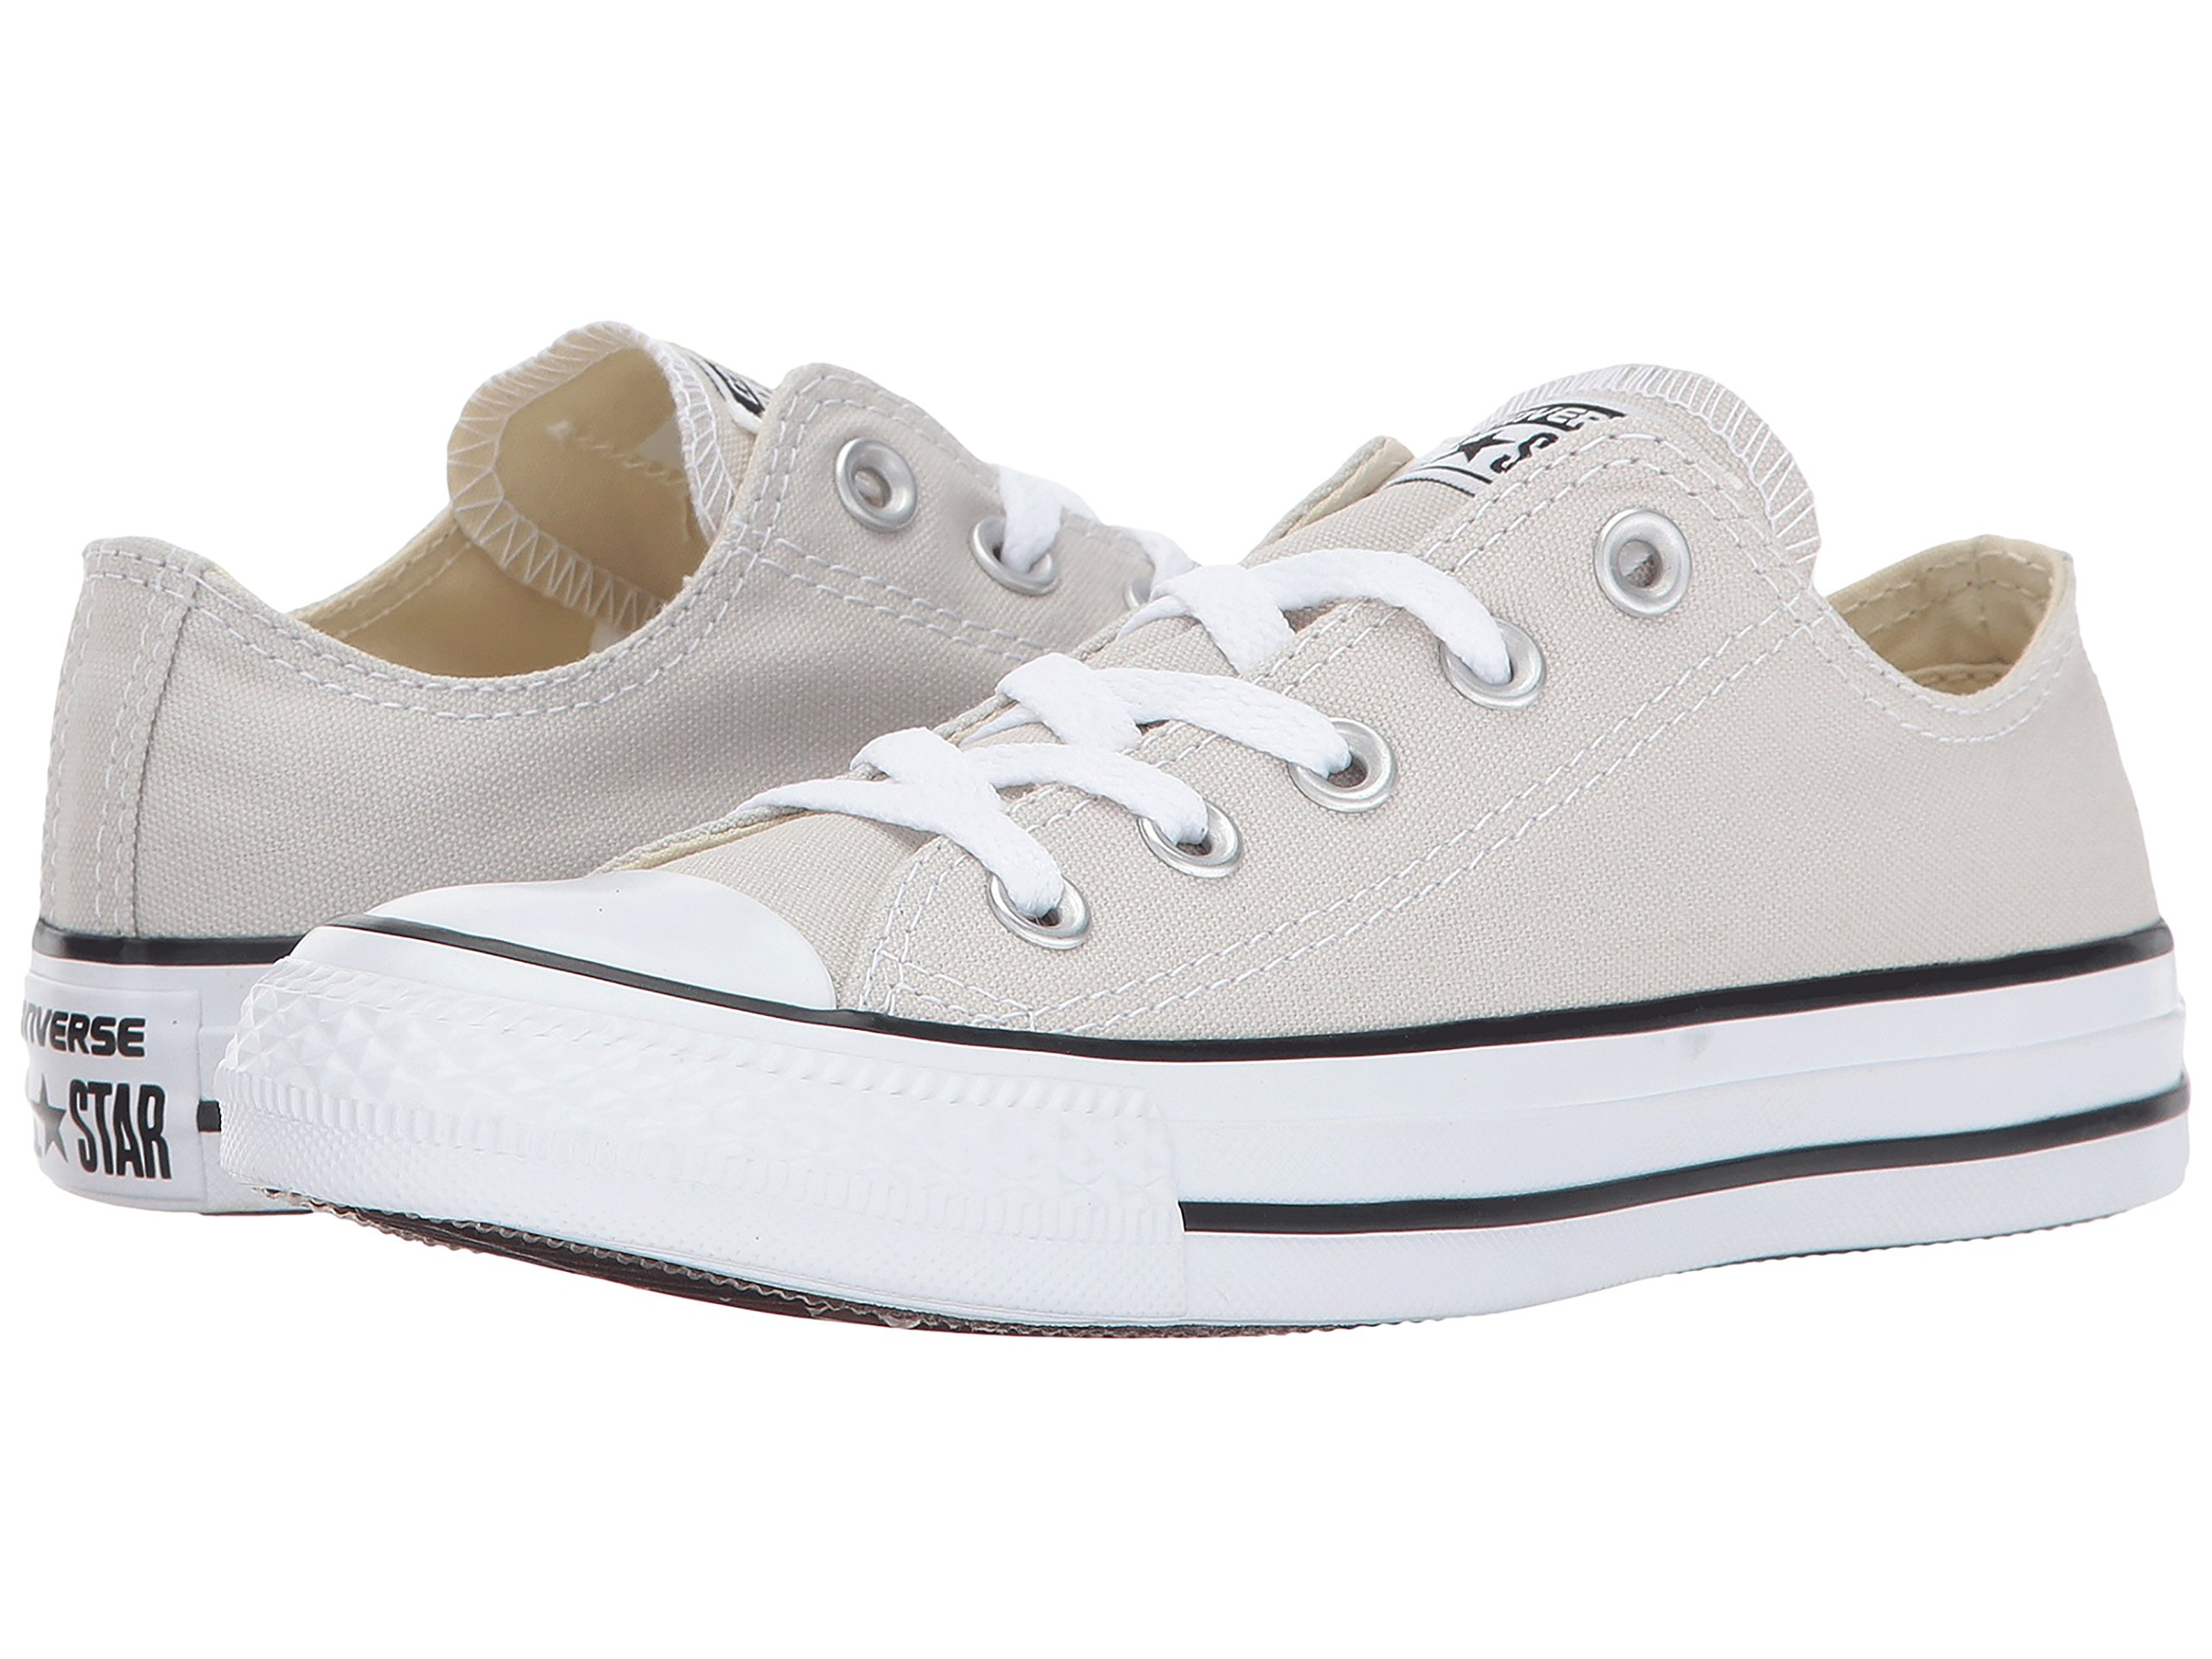 Converse Chuck Taylor All Star Seasonal Ox Low Top Sneaker (4 D(M) US)